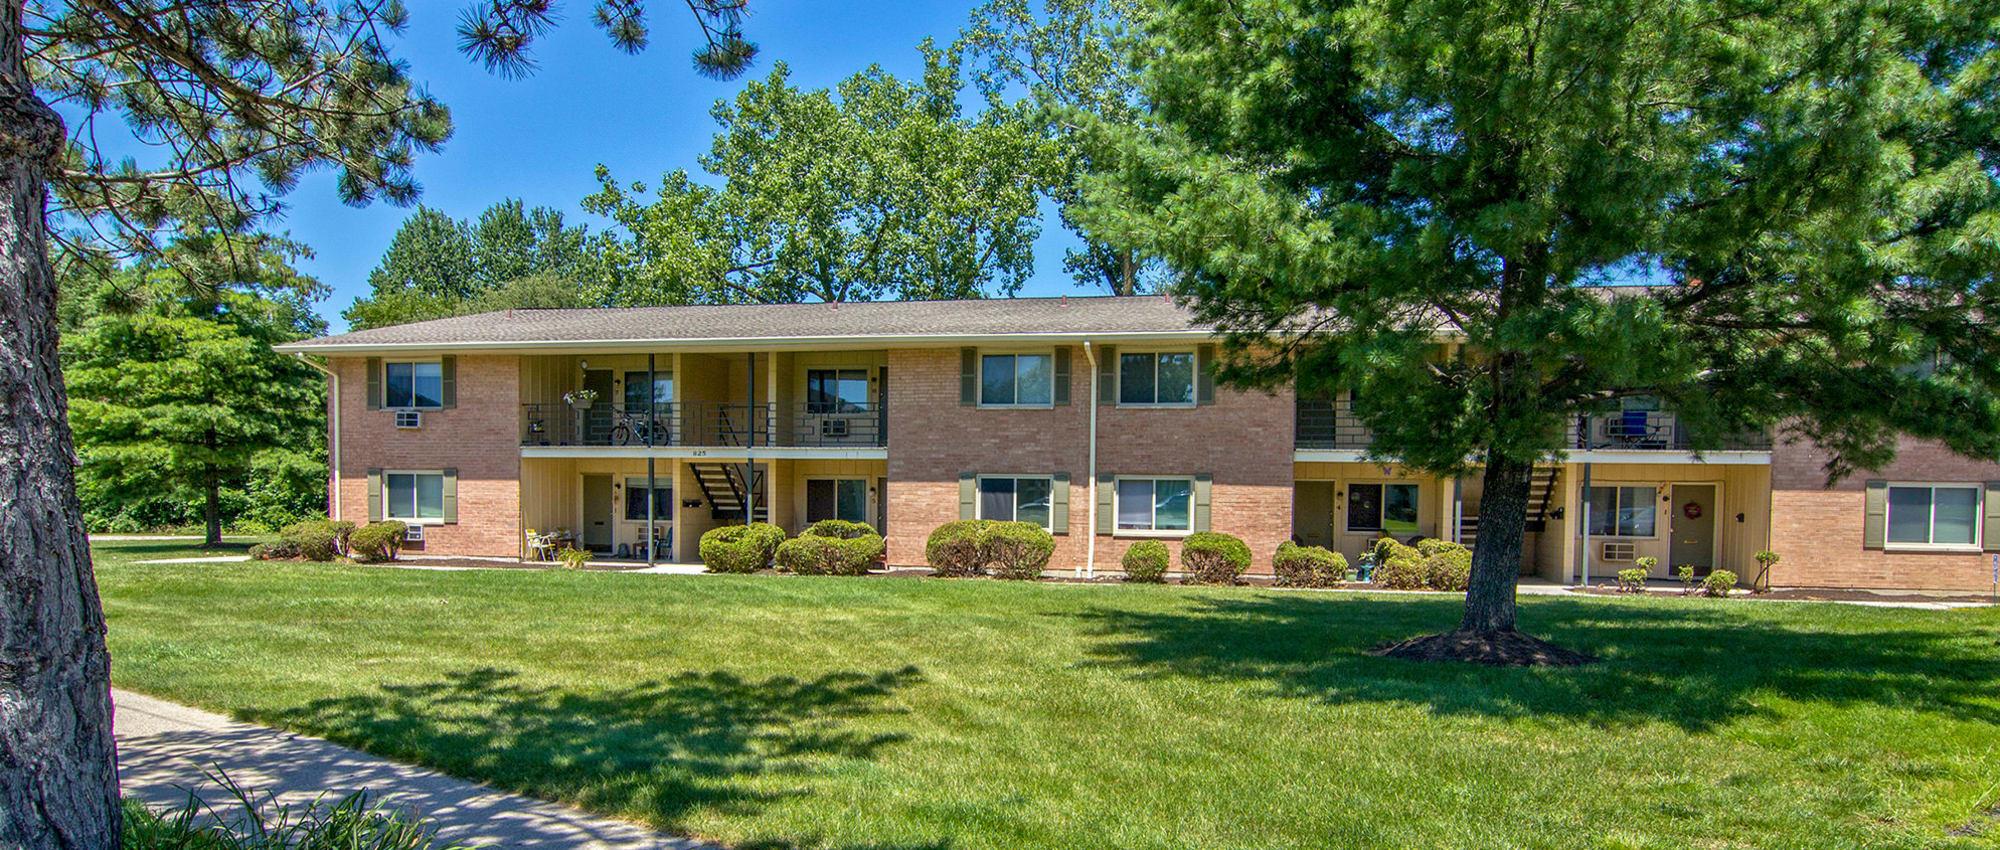 Apartments at The Summit at Ridgewood in Fort Wayne, Indiana